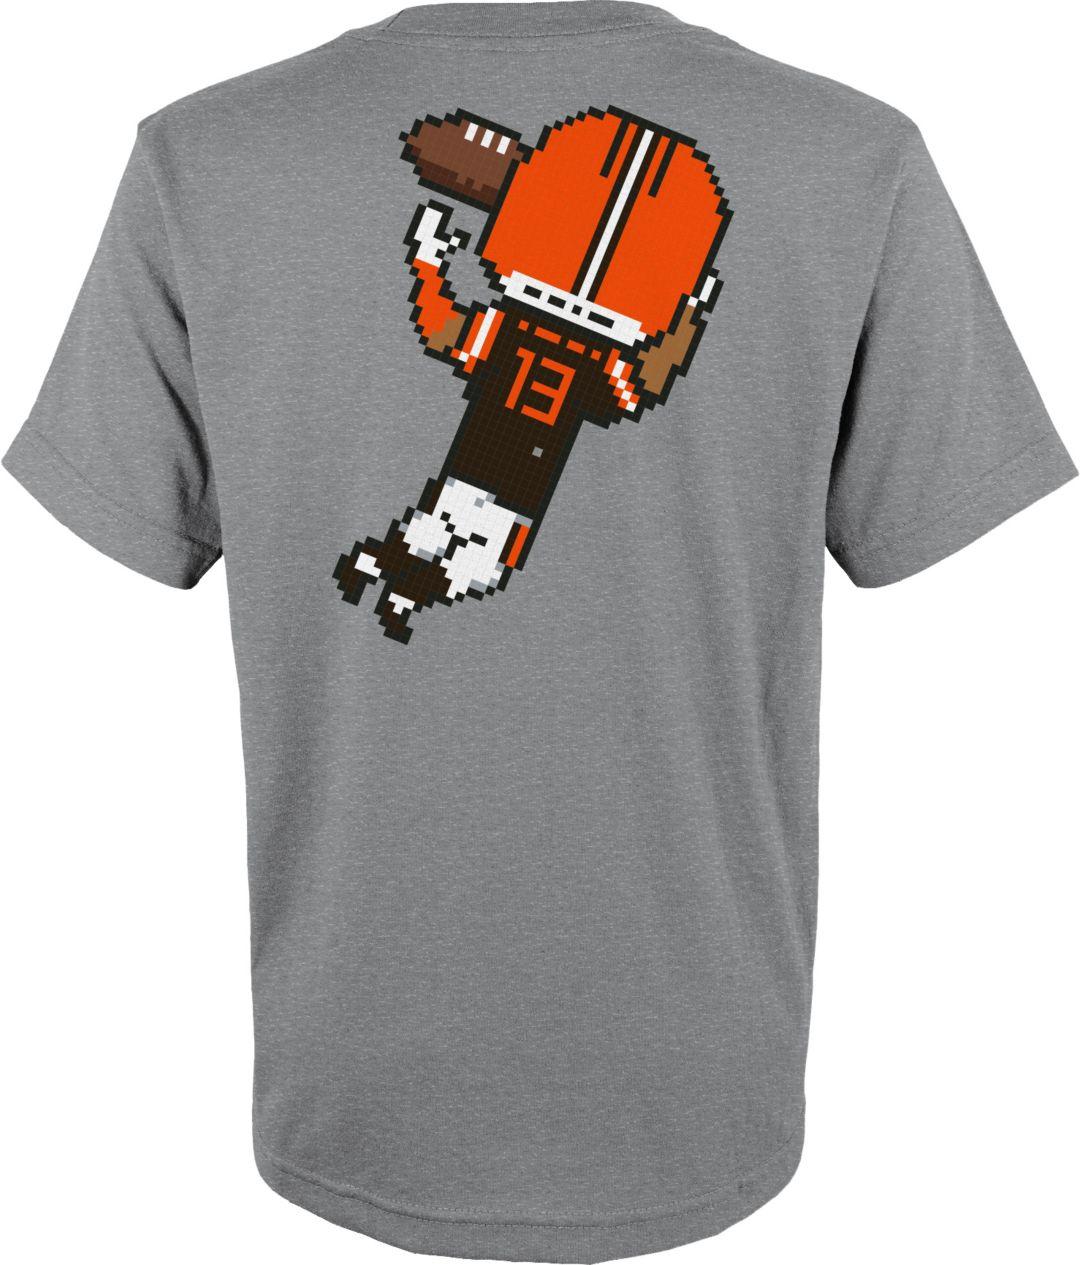 sports shoes eceae 63365 NFL Team Apparel Youth Cleveland Browns Odell Beckham Jr. #13 Pixel T-Shirt